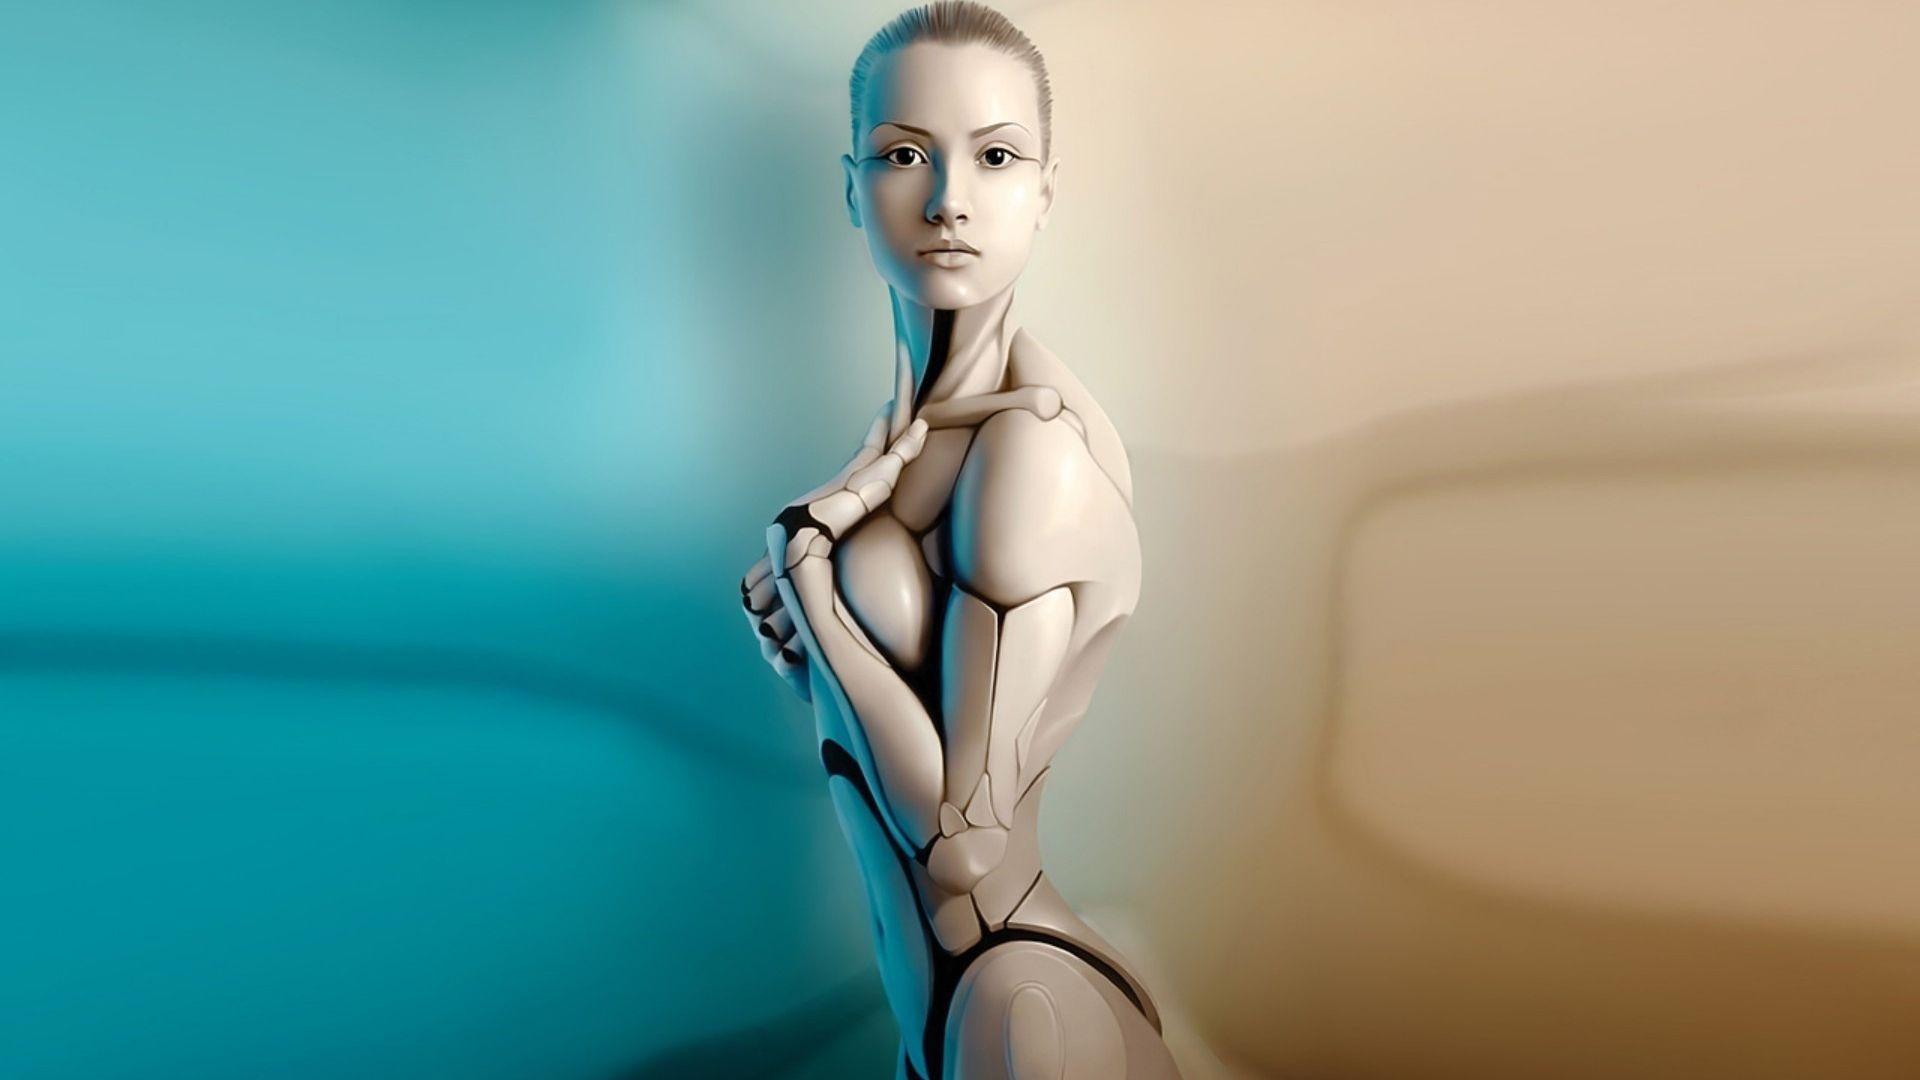 Nude Female Replicant, Artificial Intelligence Art